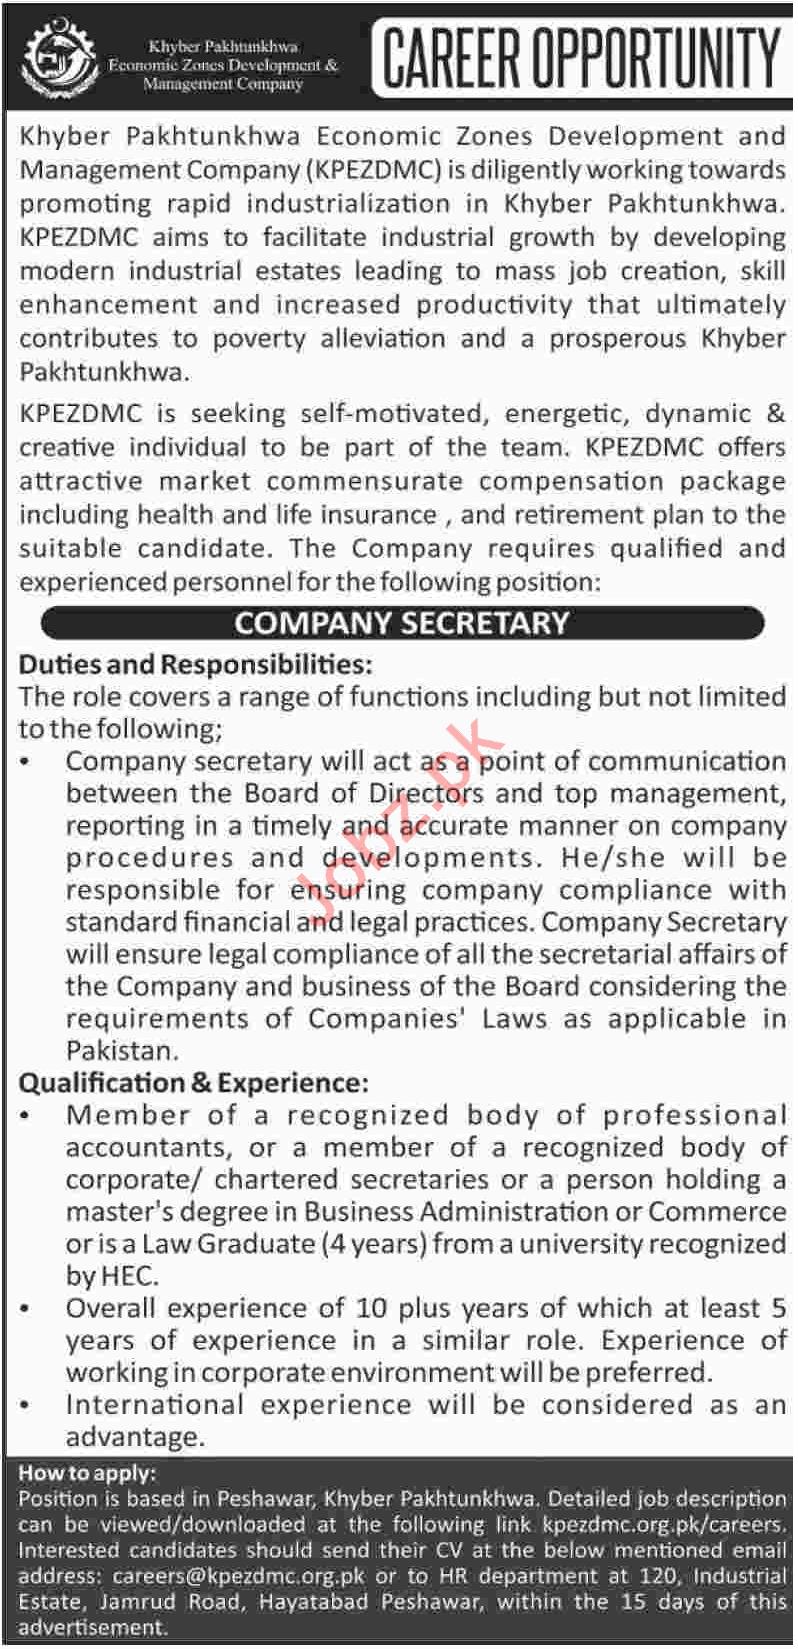 KPK Economic Zones Development and Management Co KPEZDMC Job